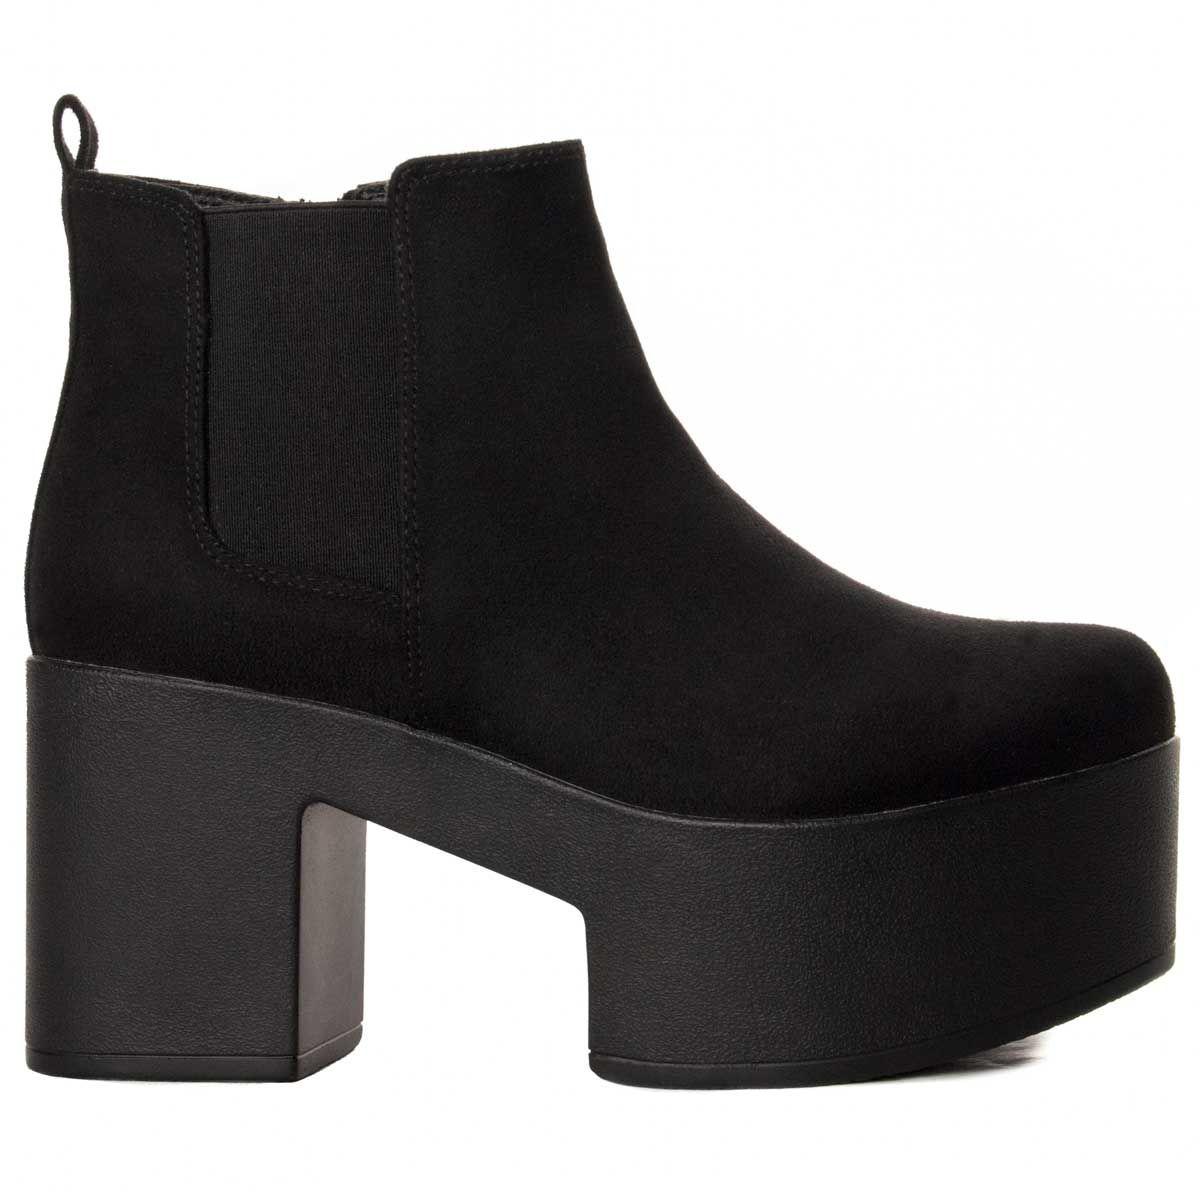 Montevita Platform Ankle Boot in Black